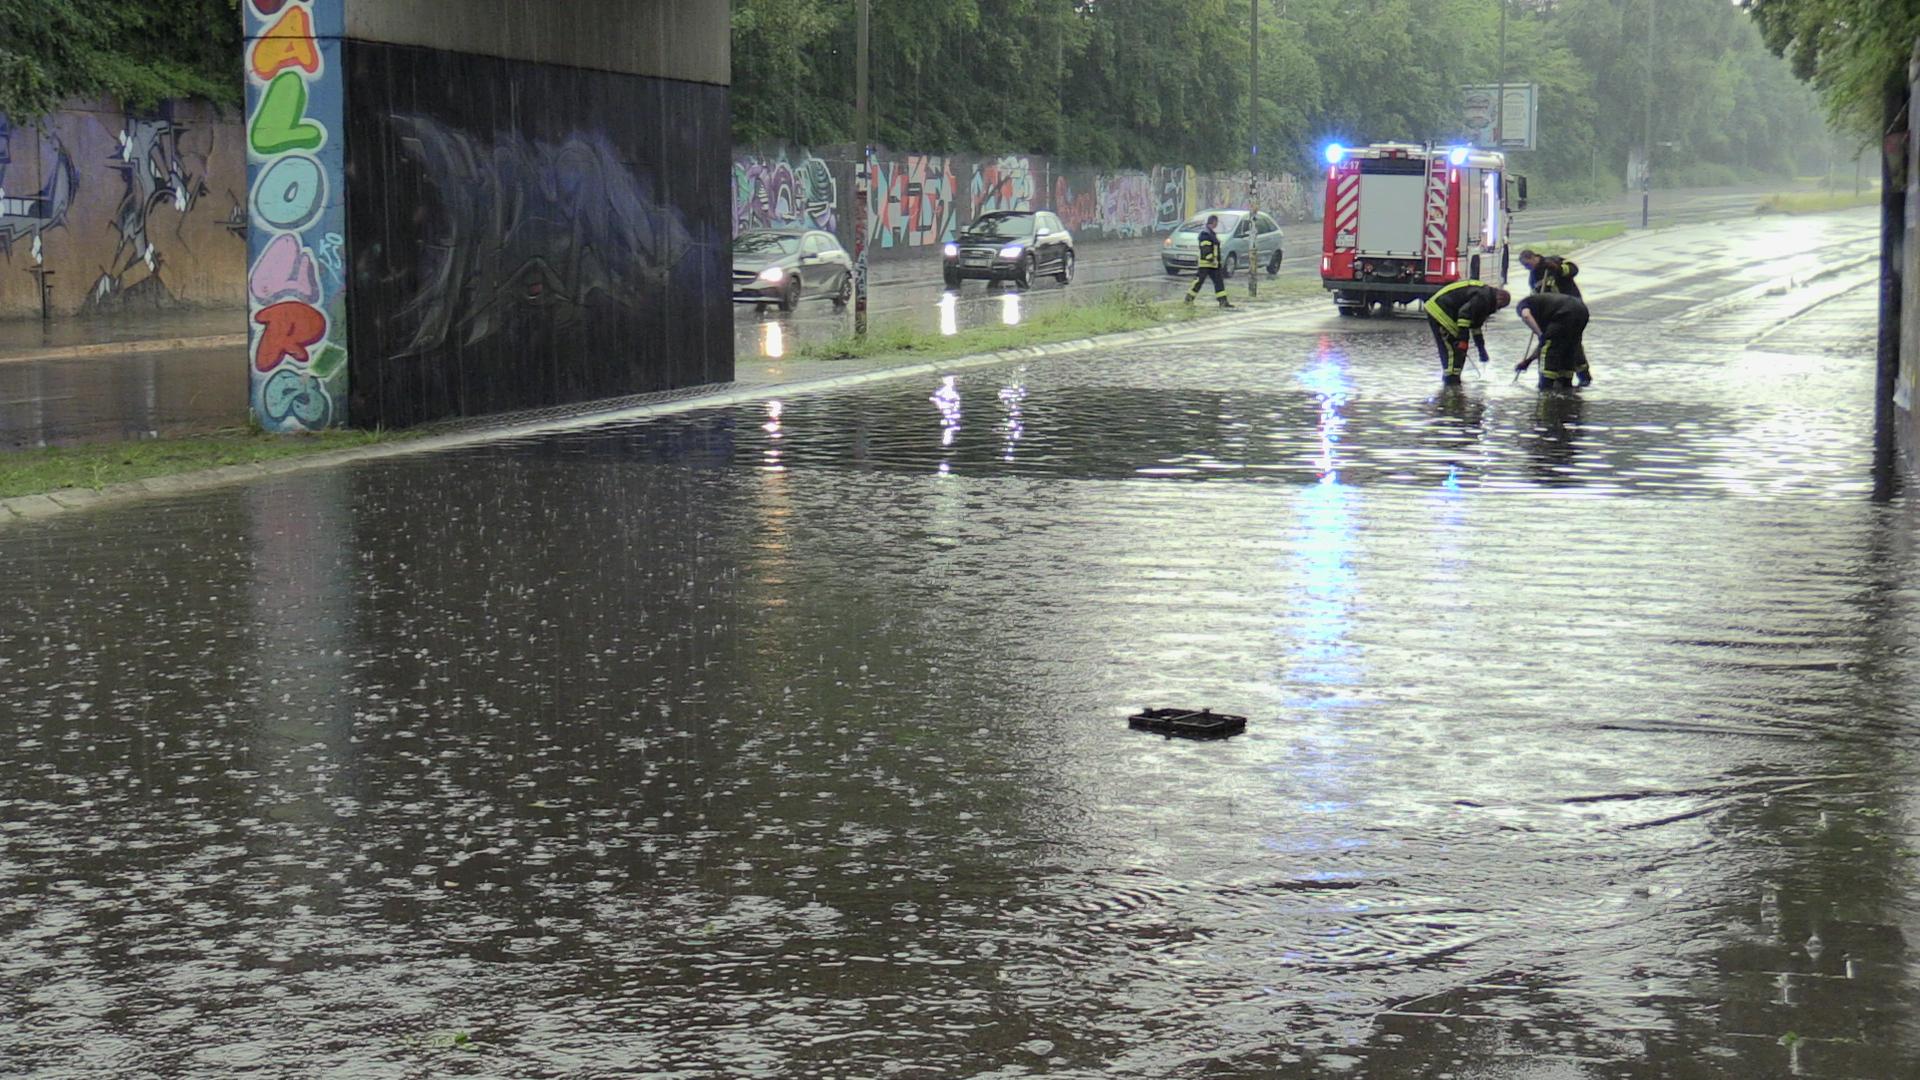 Wetter Duisburg Heute